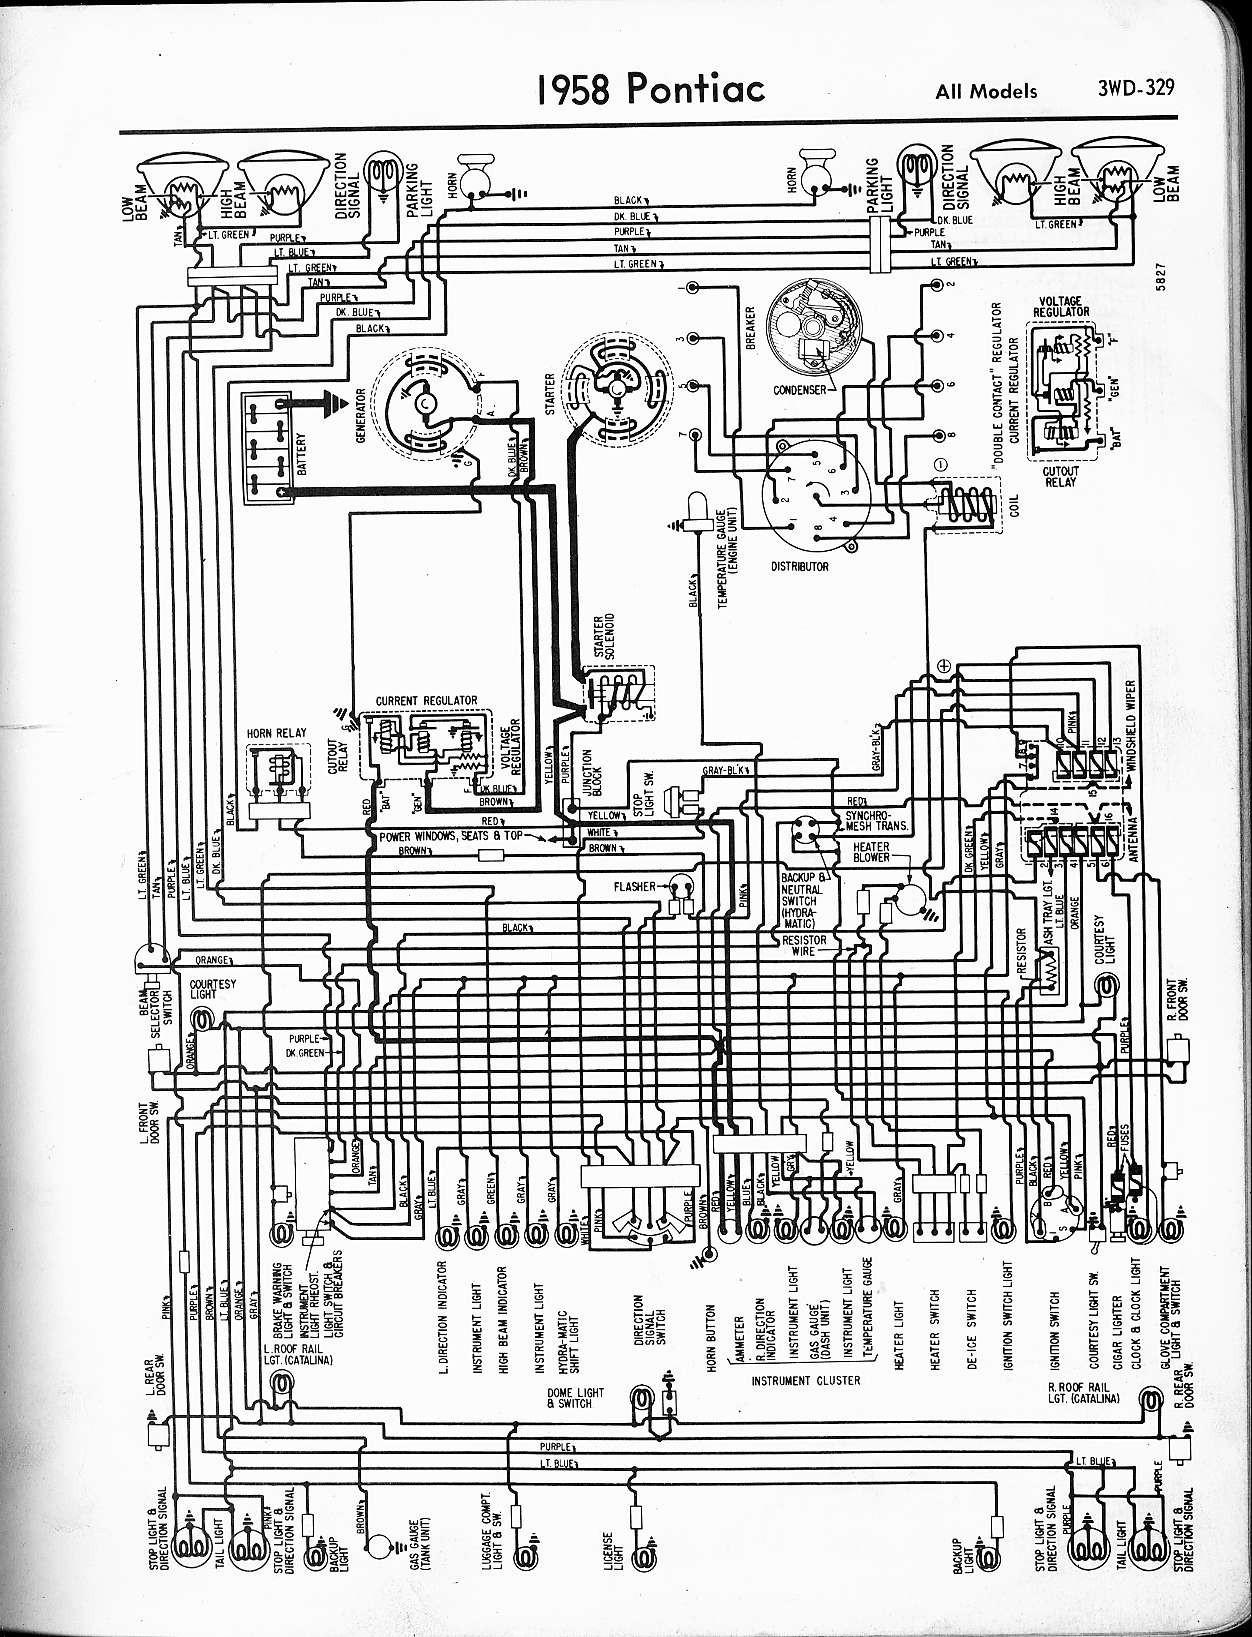 2001 Pontiac Grand Am Engine Diagram Mwire5765 329 within 2003 Pontiac Grand Am Wiring Diagram Of 2001 Pontiac Grand Am Engine Diagram